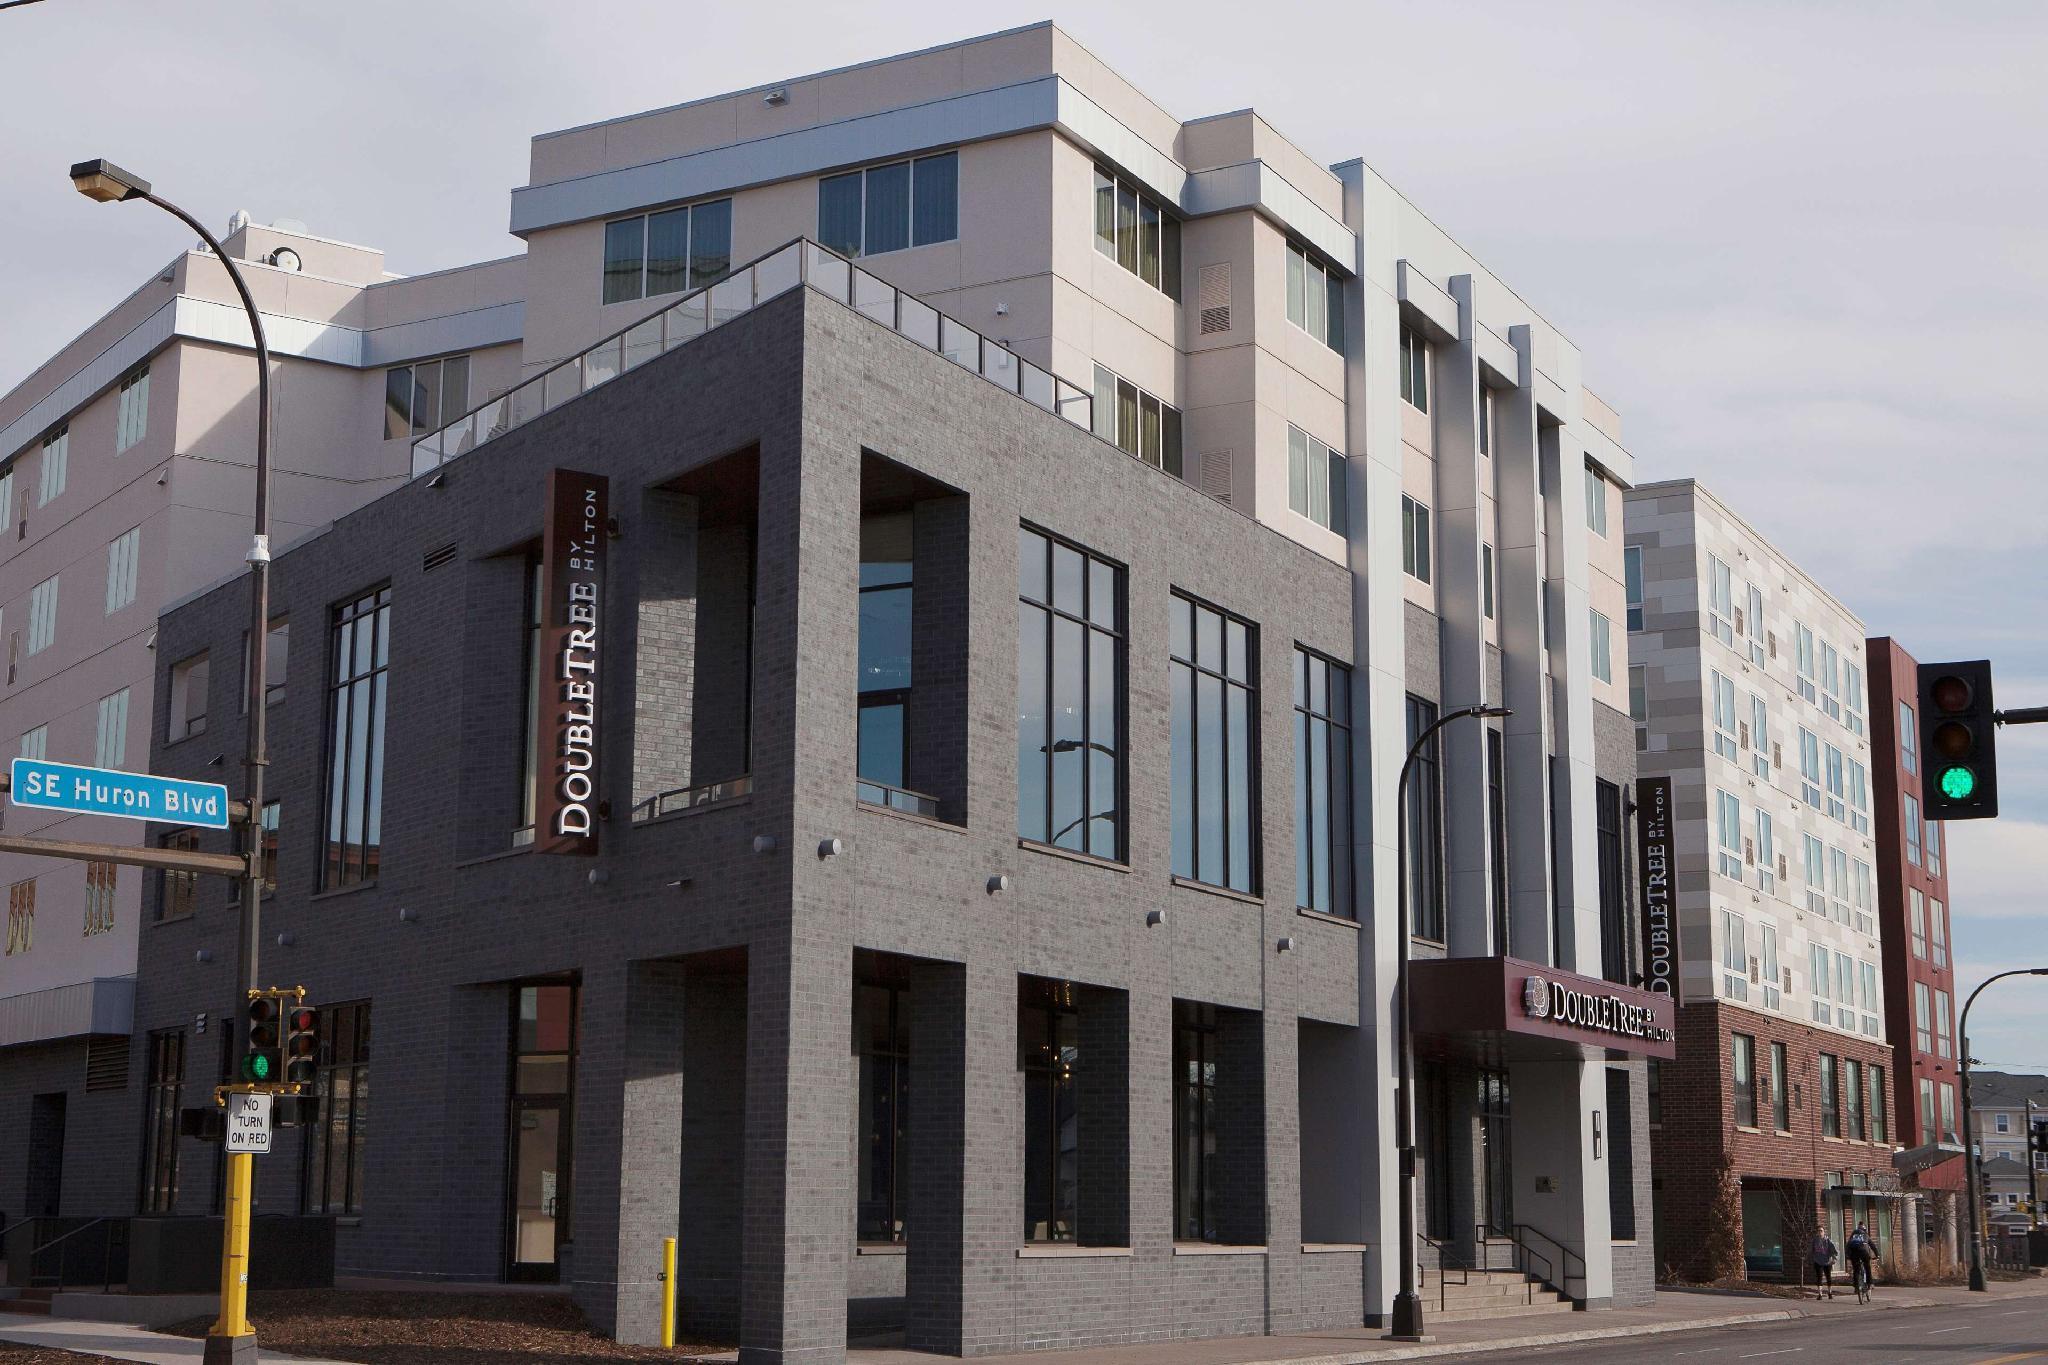 DoubleTree By Hilton Minneapolis University Area